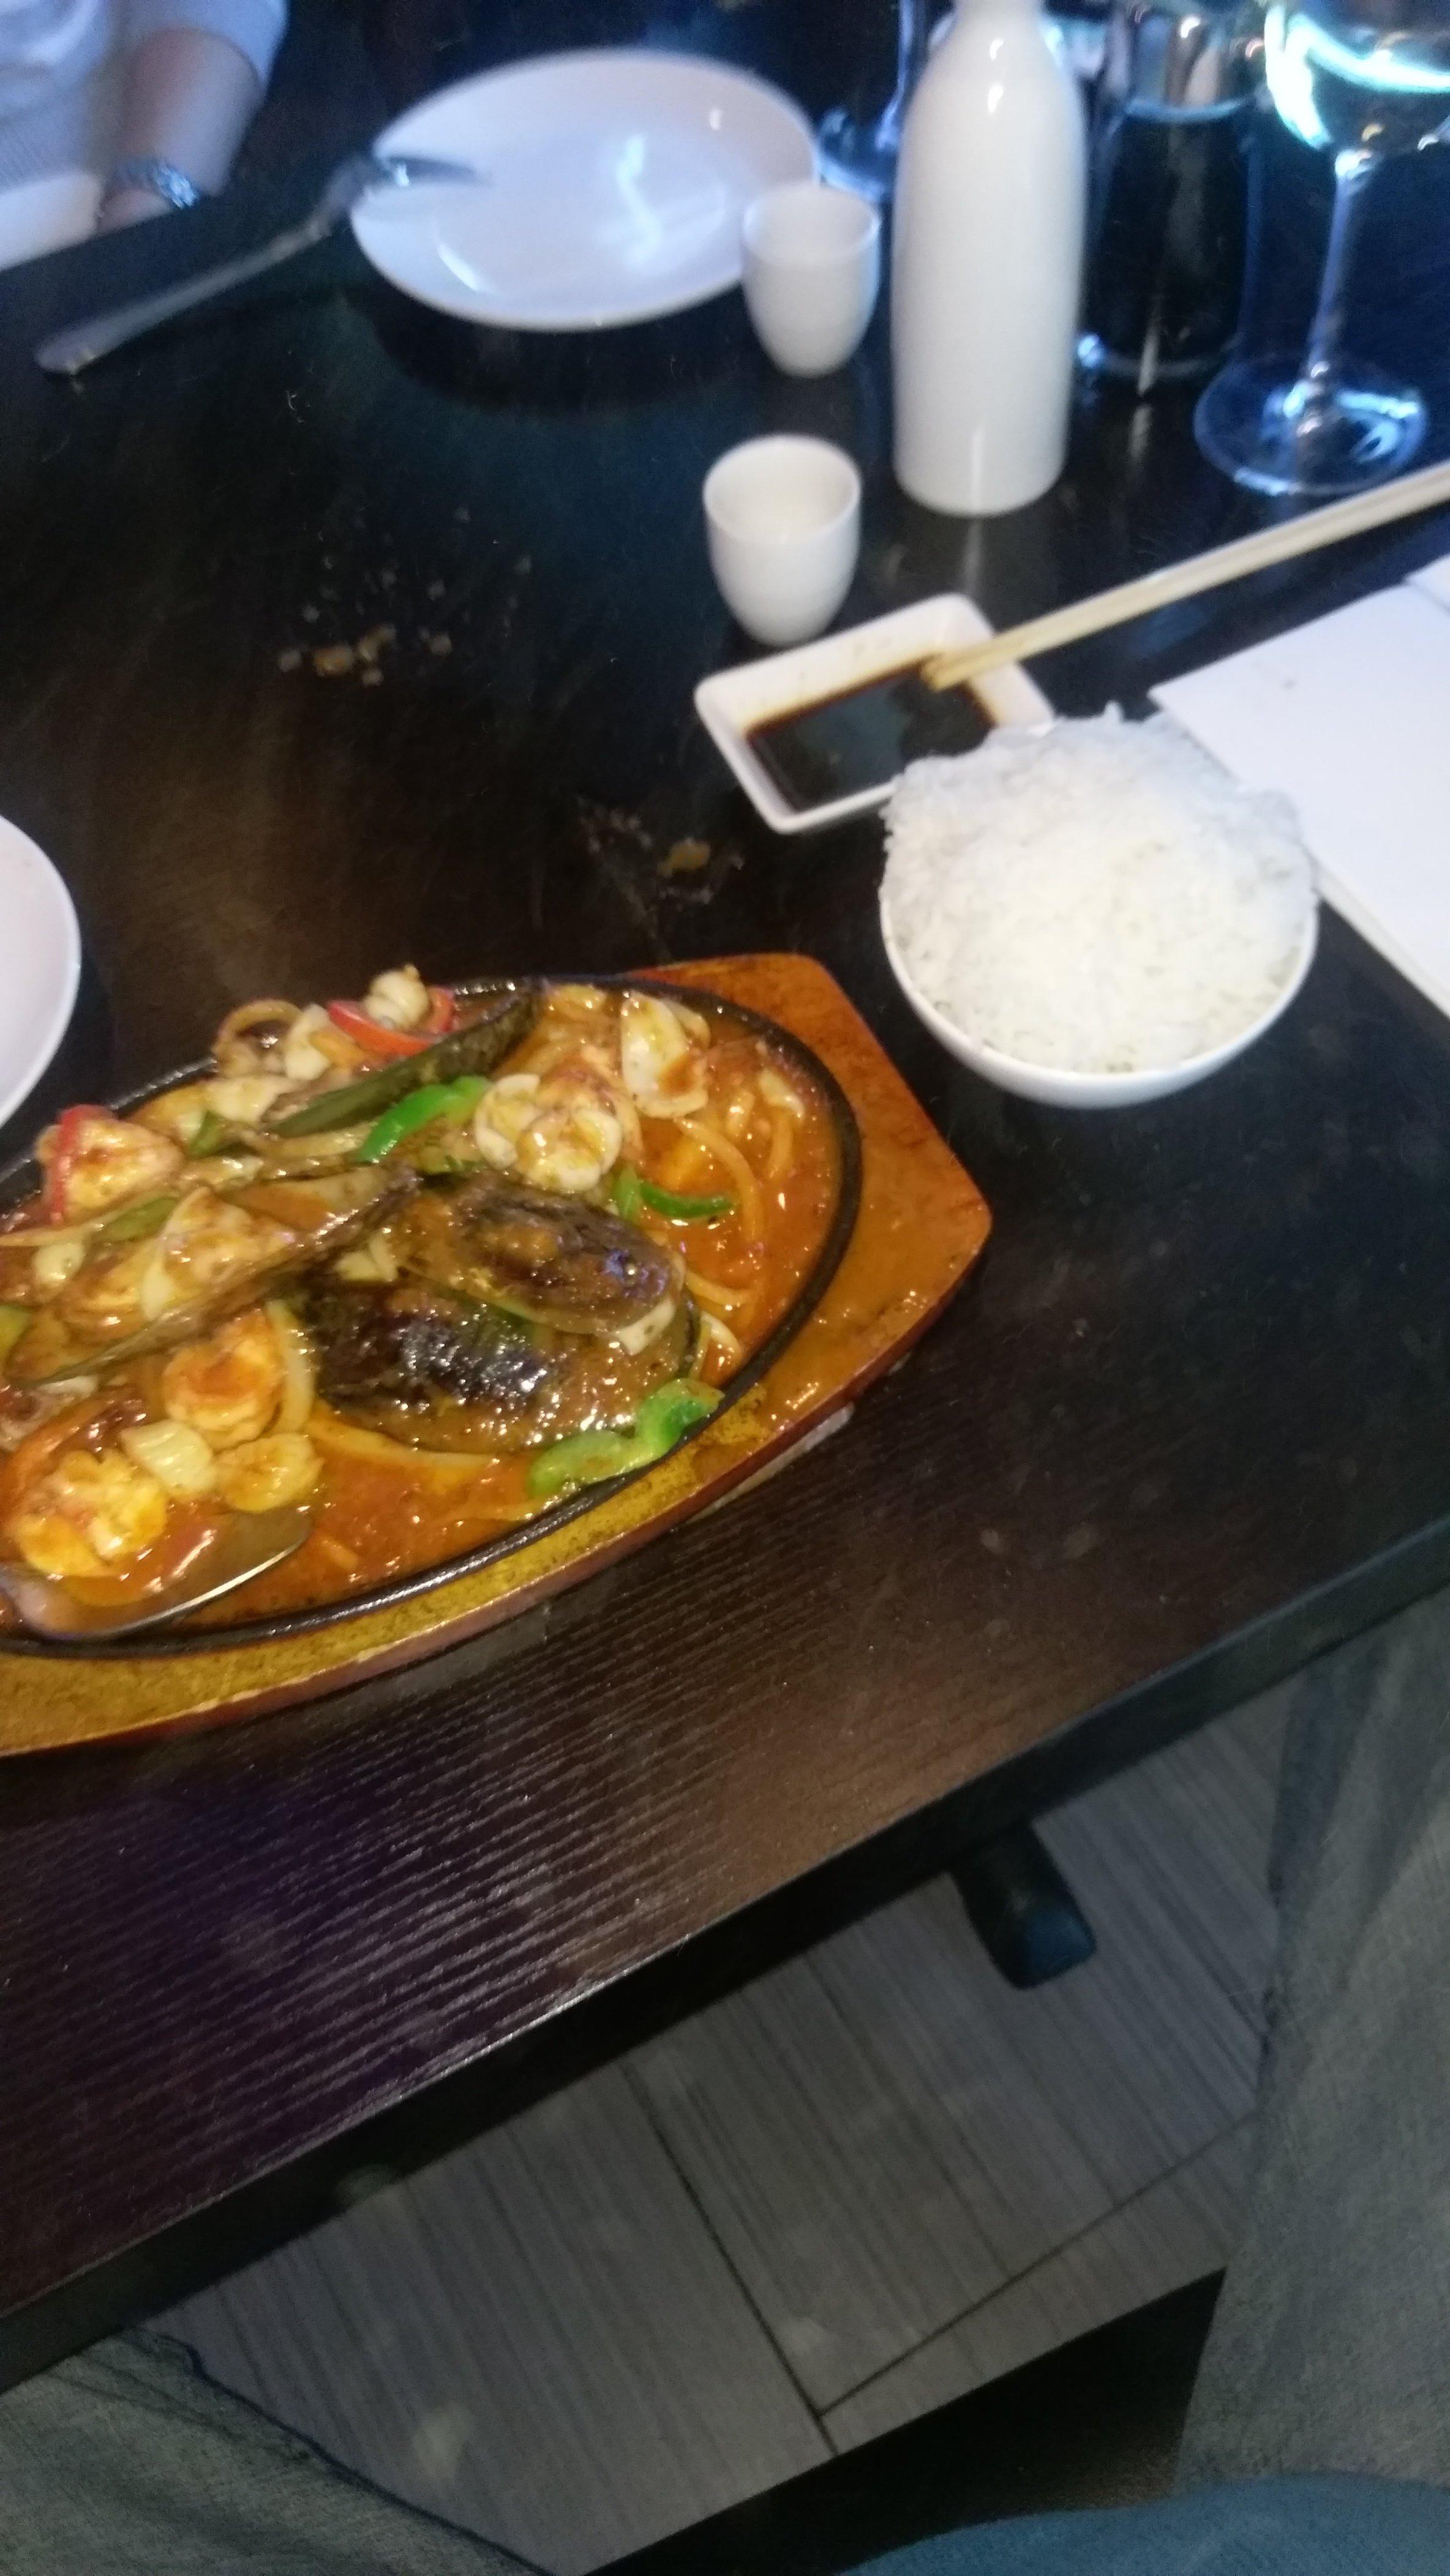 Lemongrass asian fusion mount sinai restaurant reviews for Akane japanese fusion cuisine new york ny